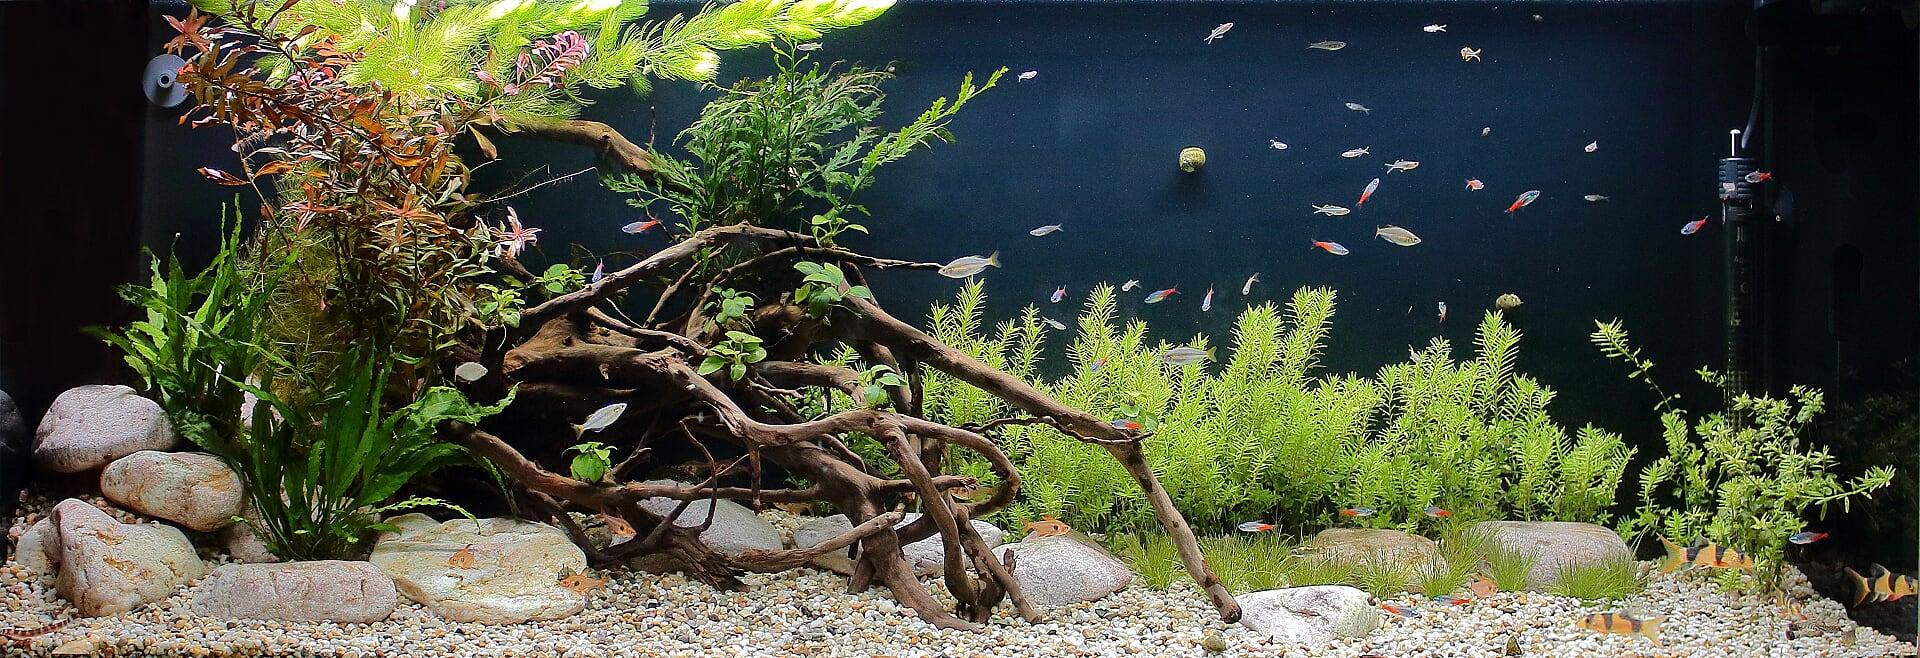 Akvárium na míru 200 litrů